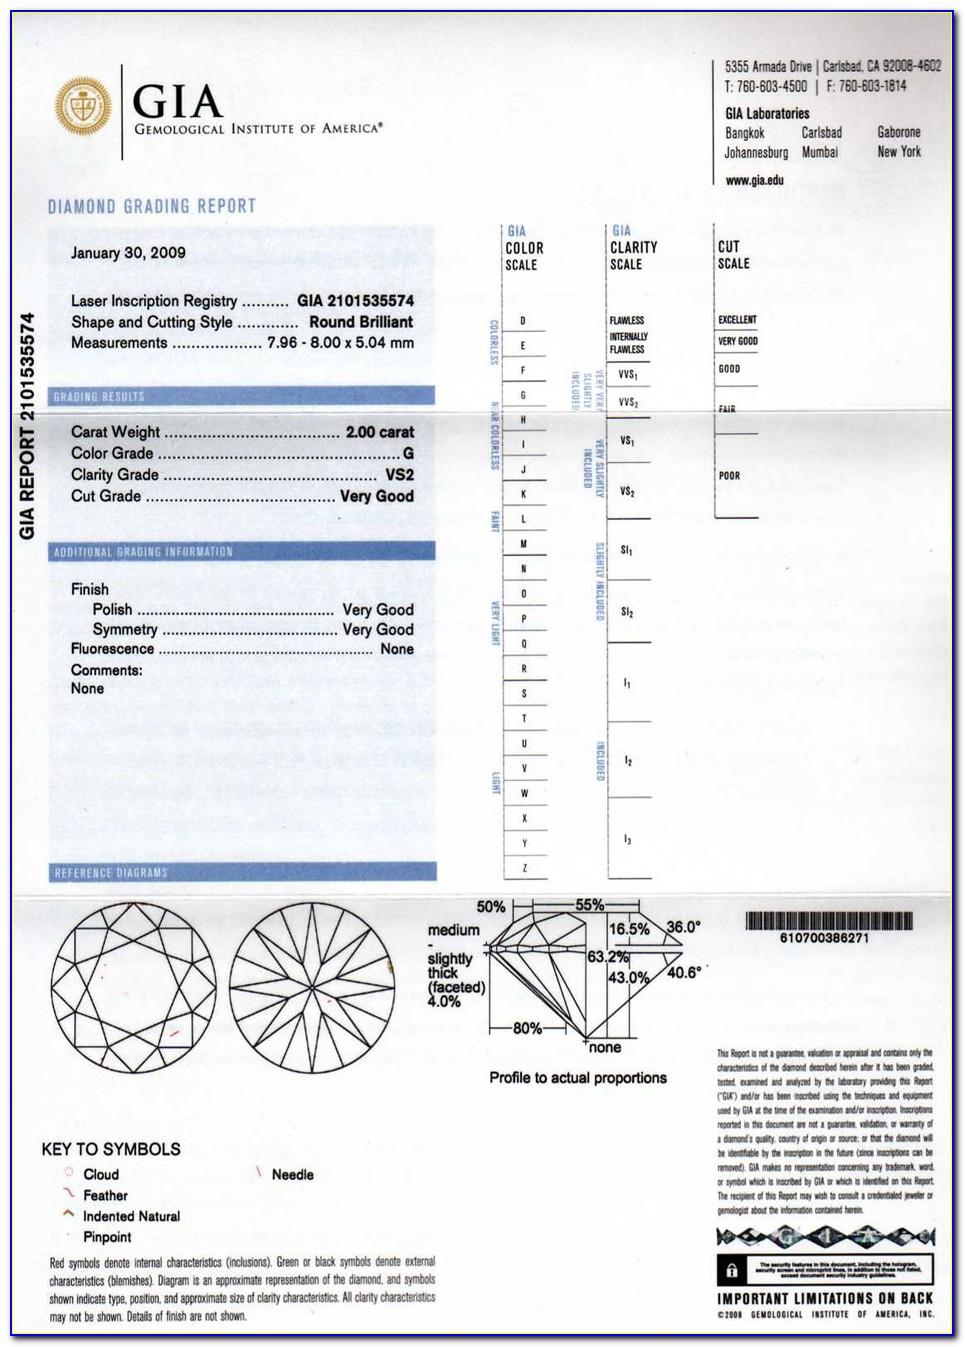 Gia Certificate Number Lookup